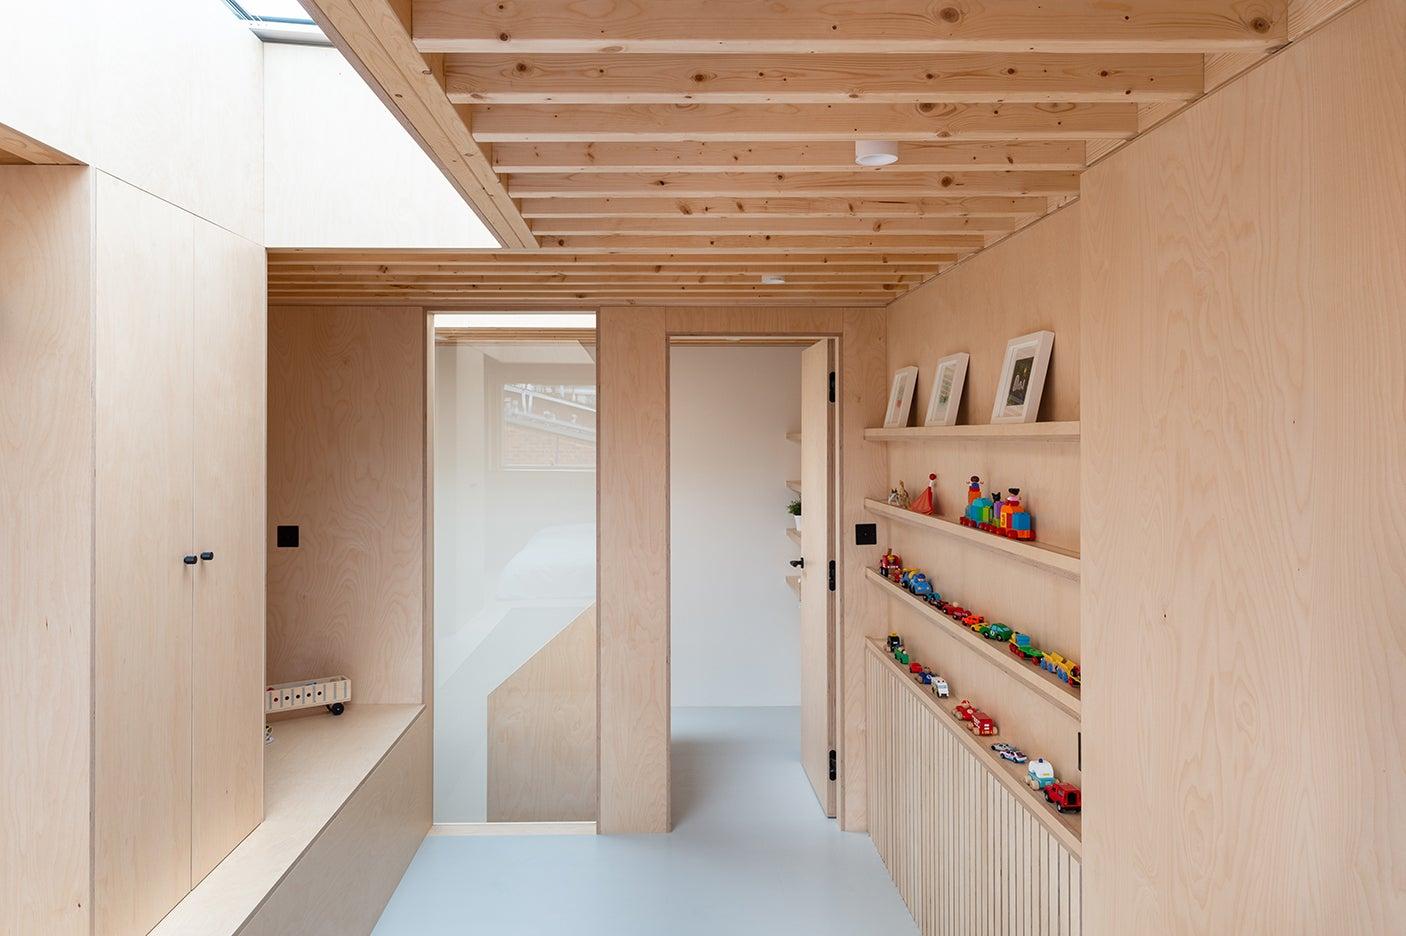 boxy [playwood room